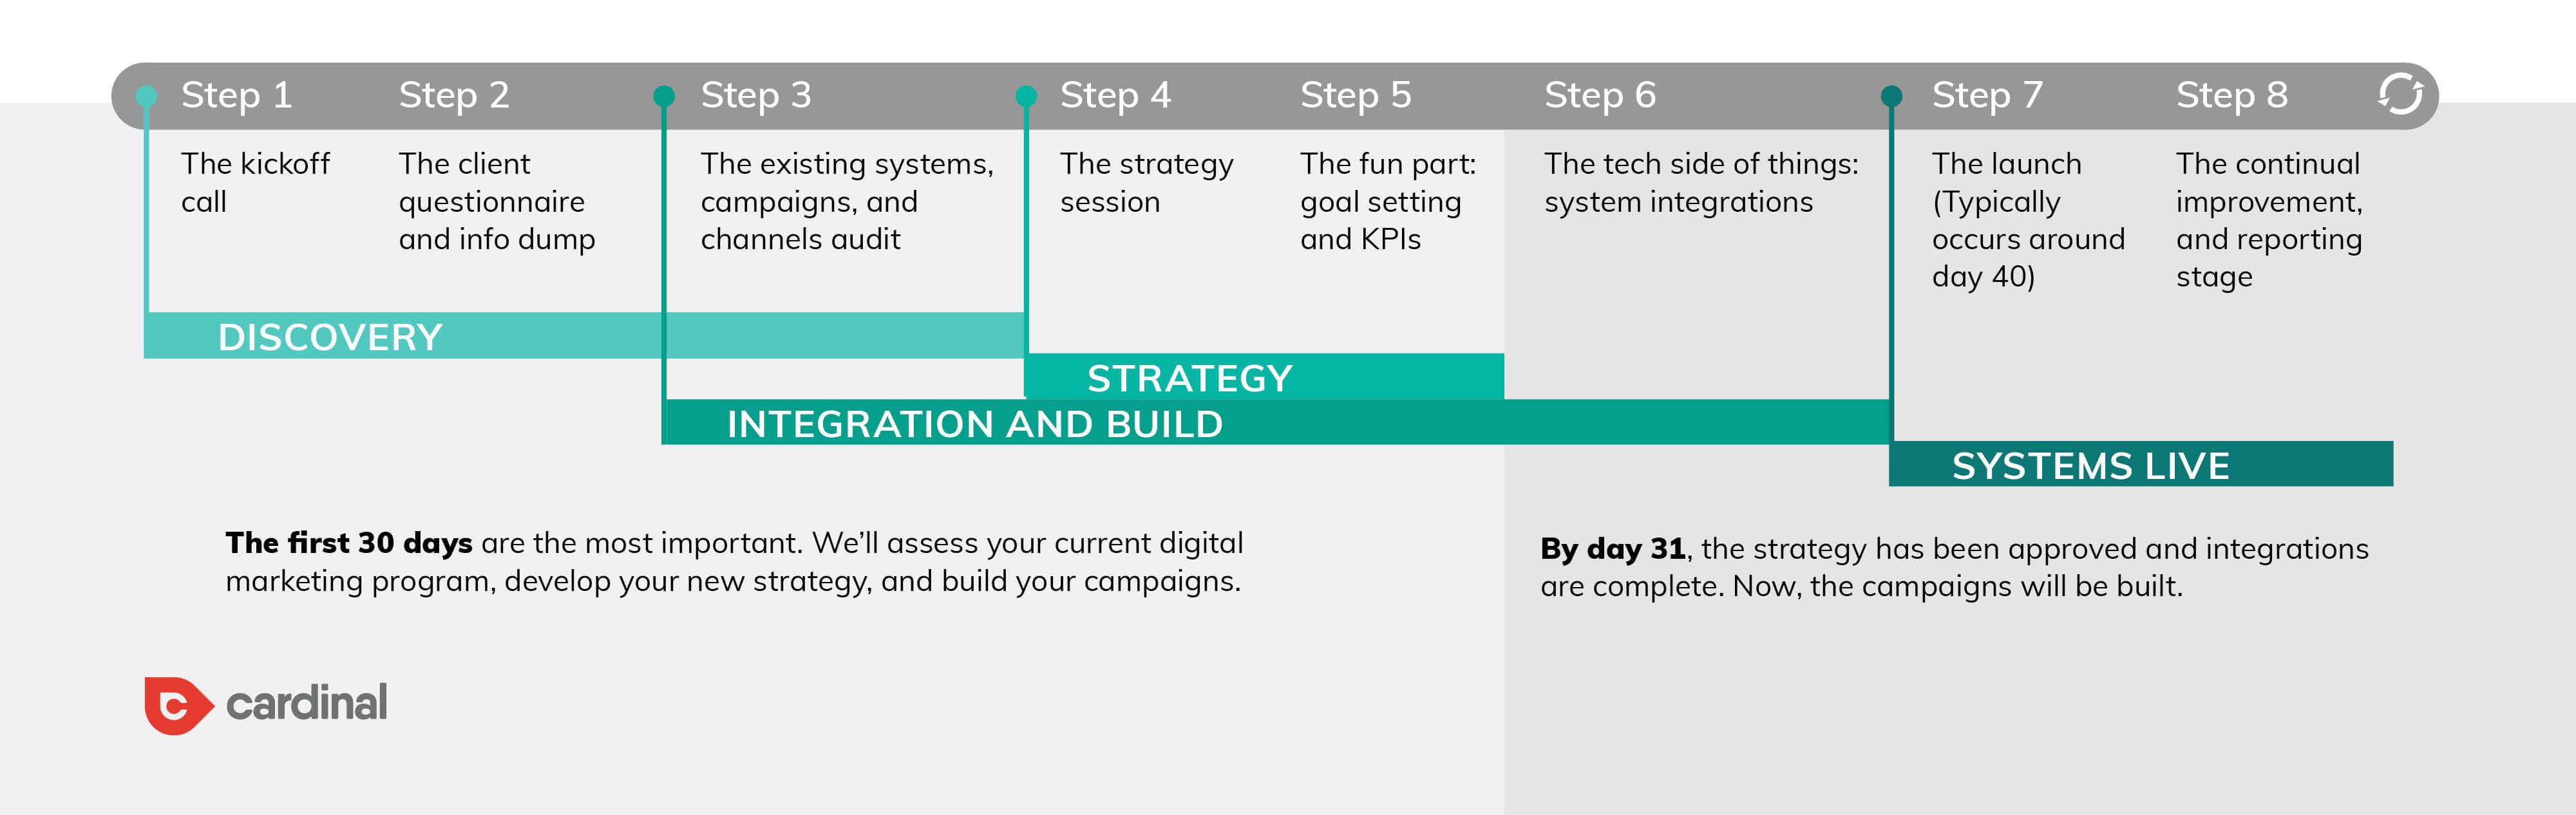 the digital marketing agency onboarding timeline